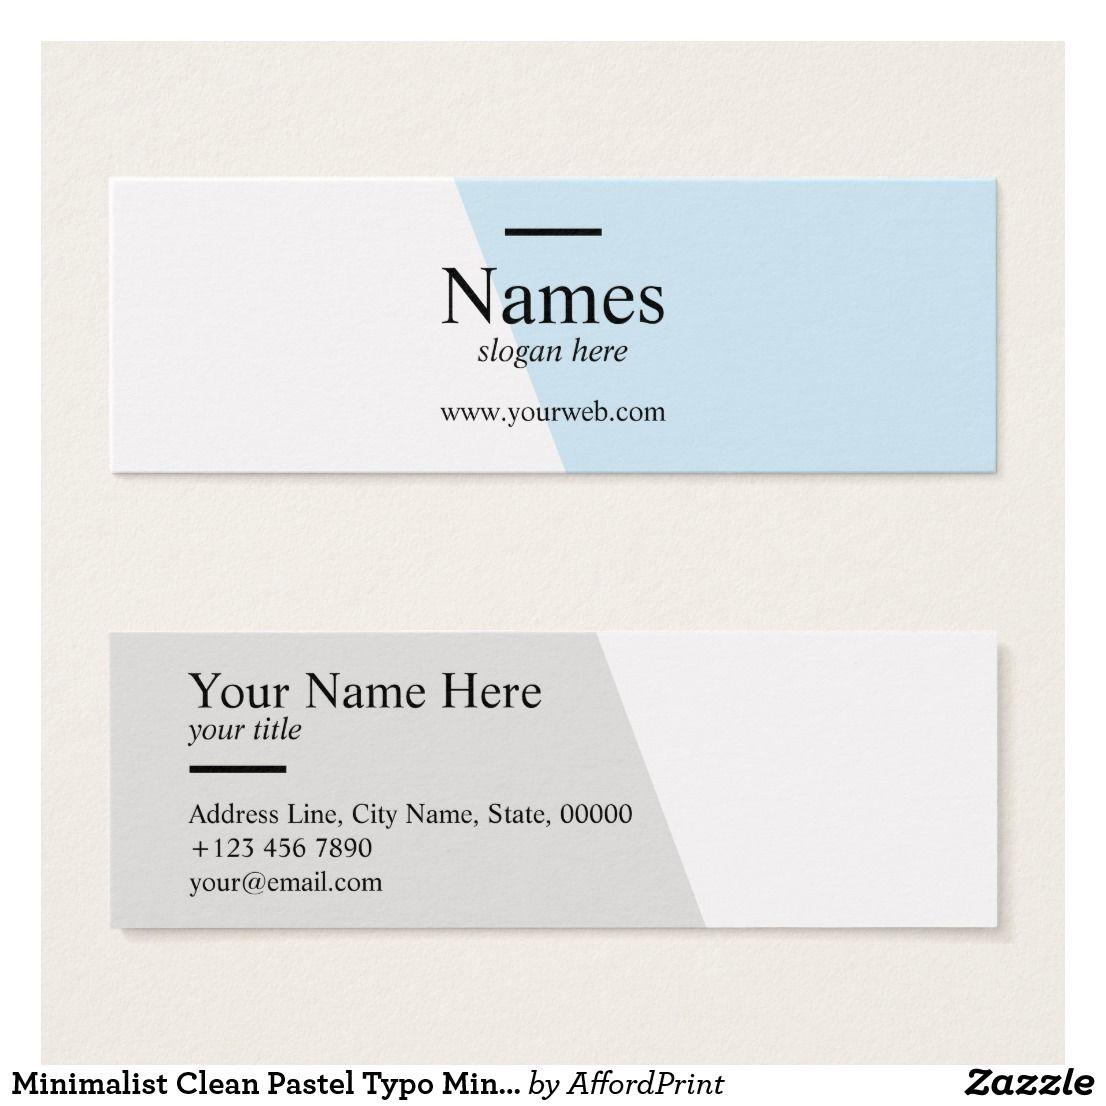 Minimalist Clean Pastel Typo Mini Business Cards Zazzle Com